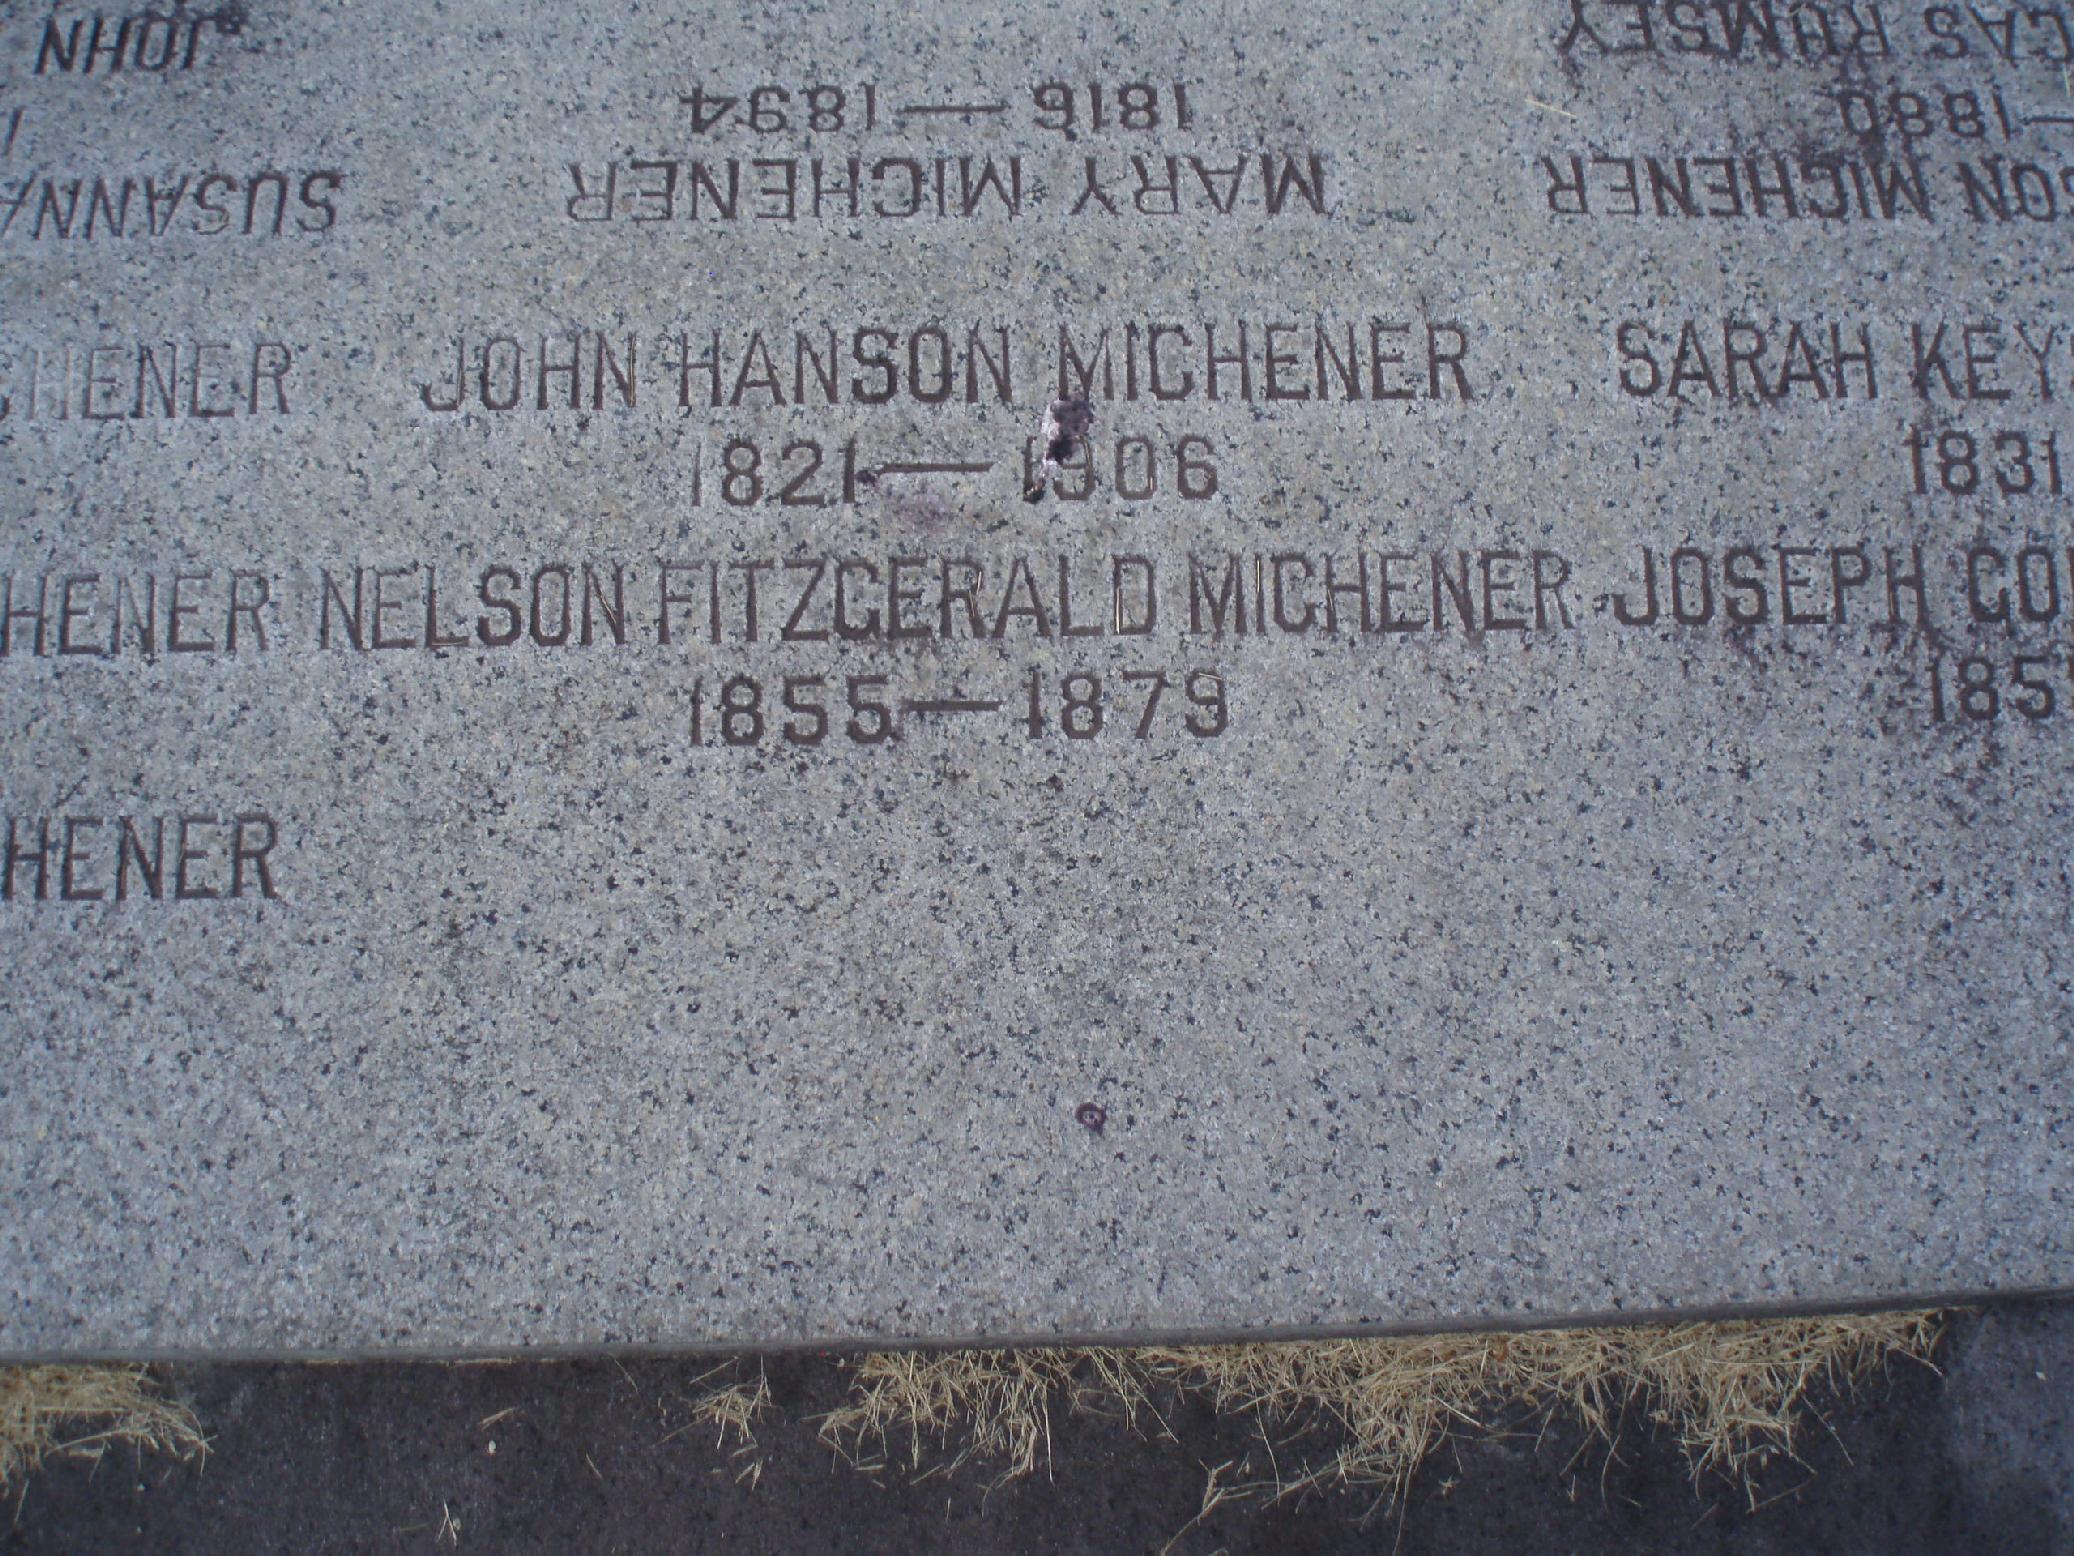 John Hanson Michener